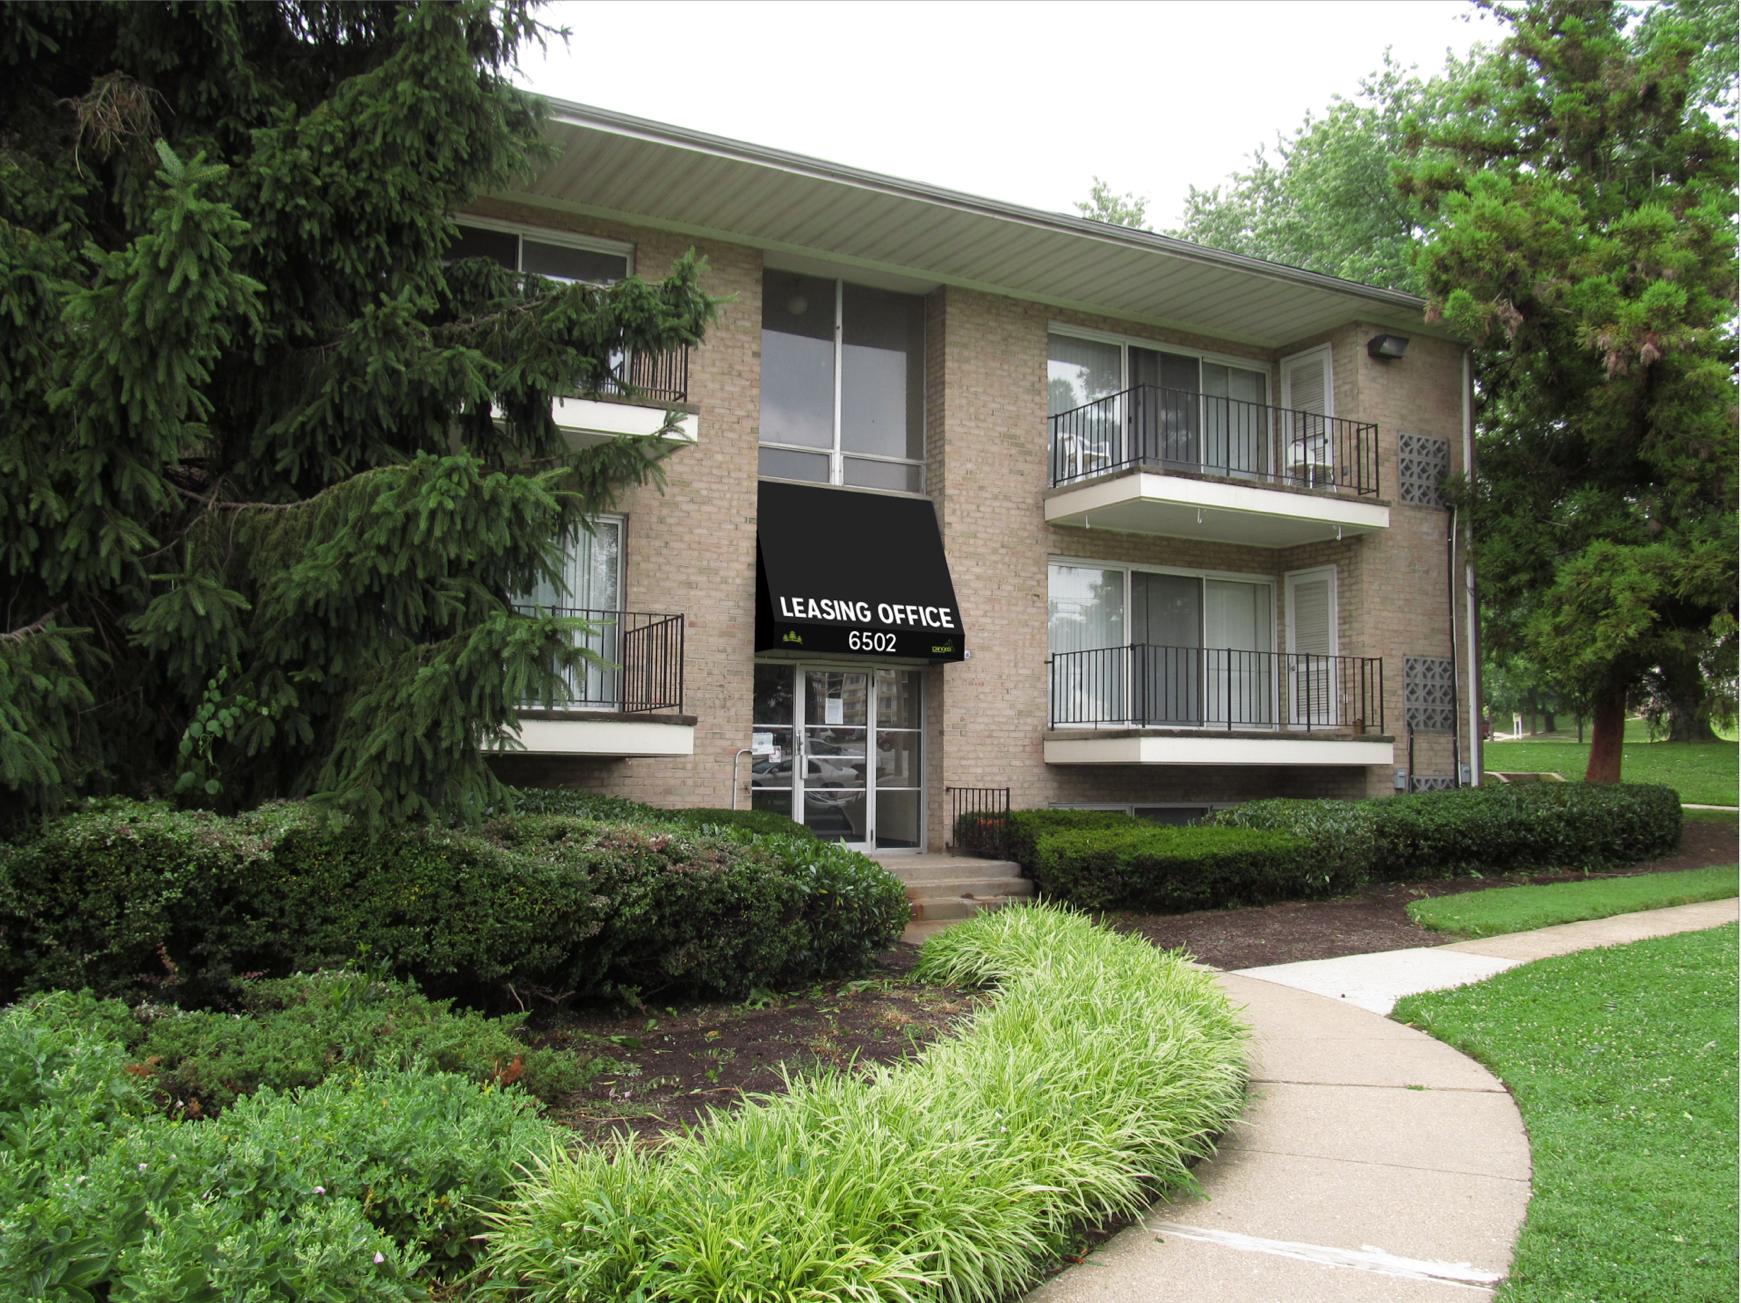 Pangea Pines Apartments image 0